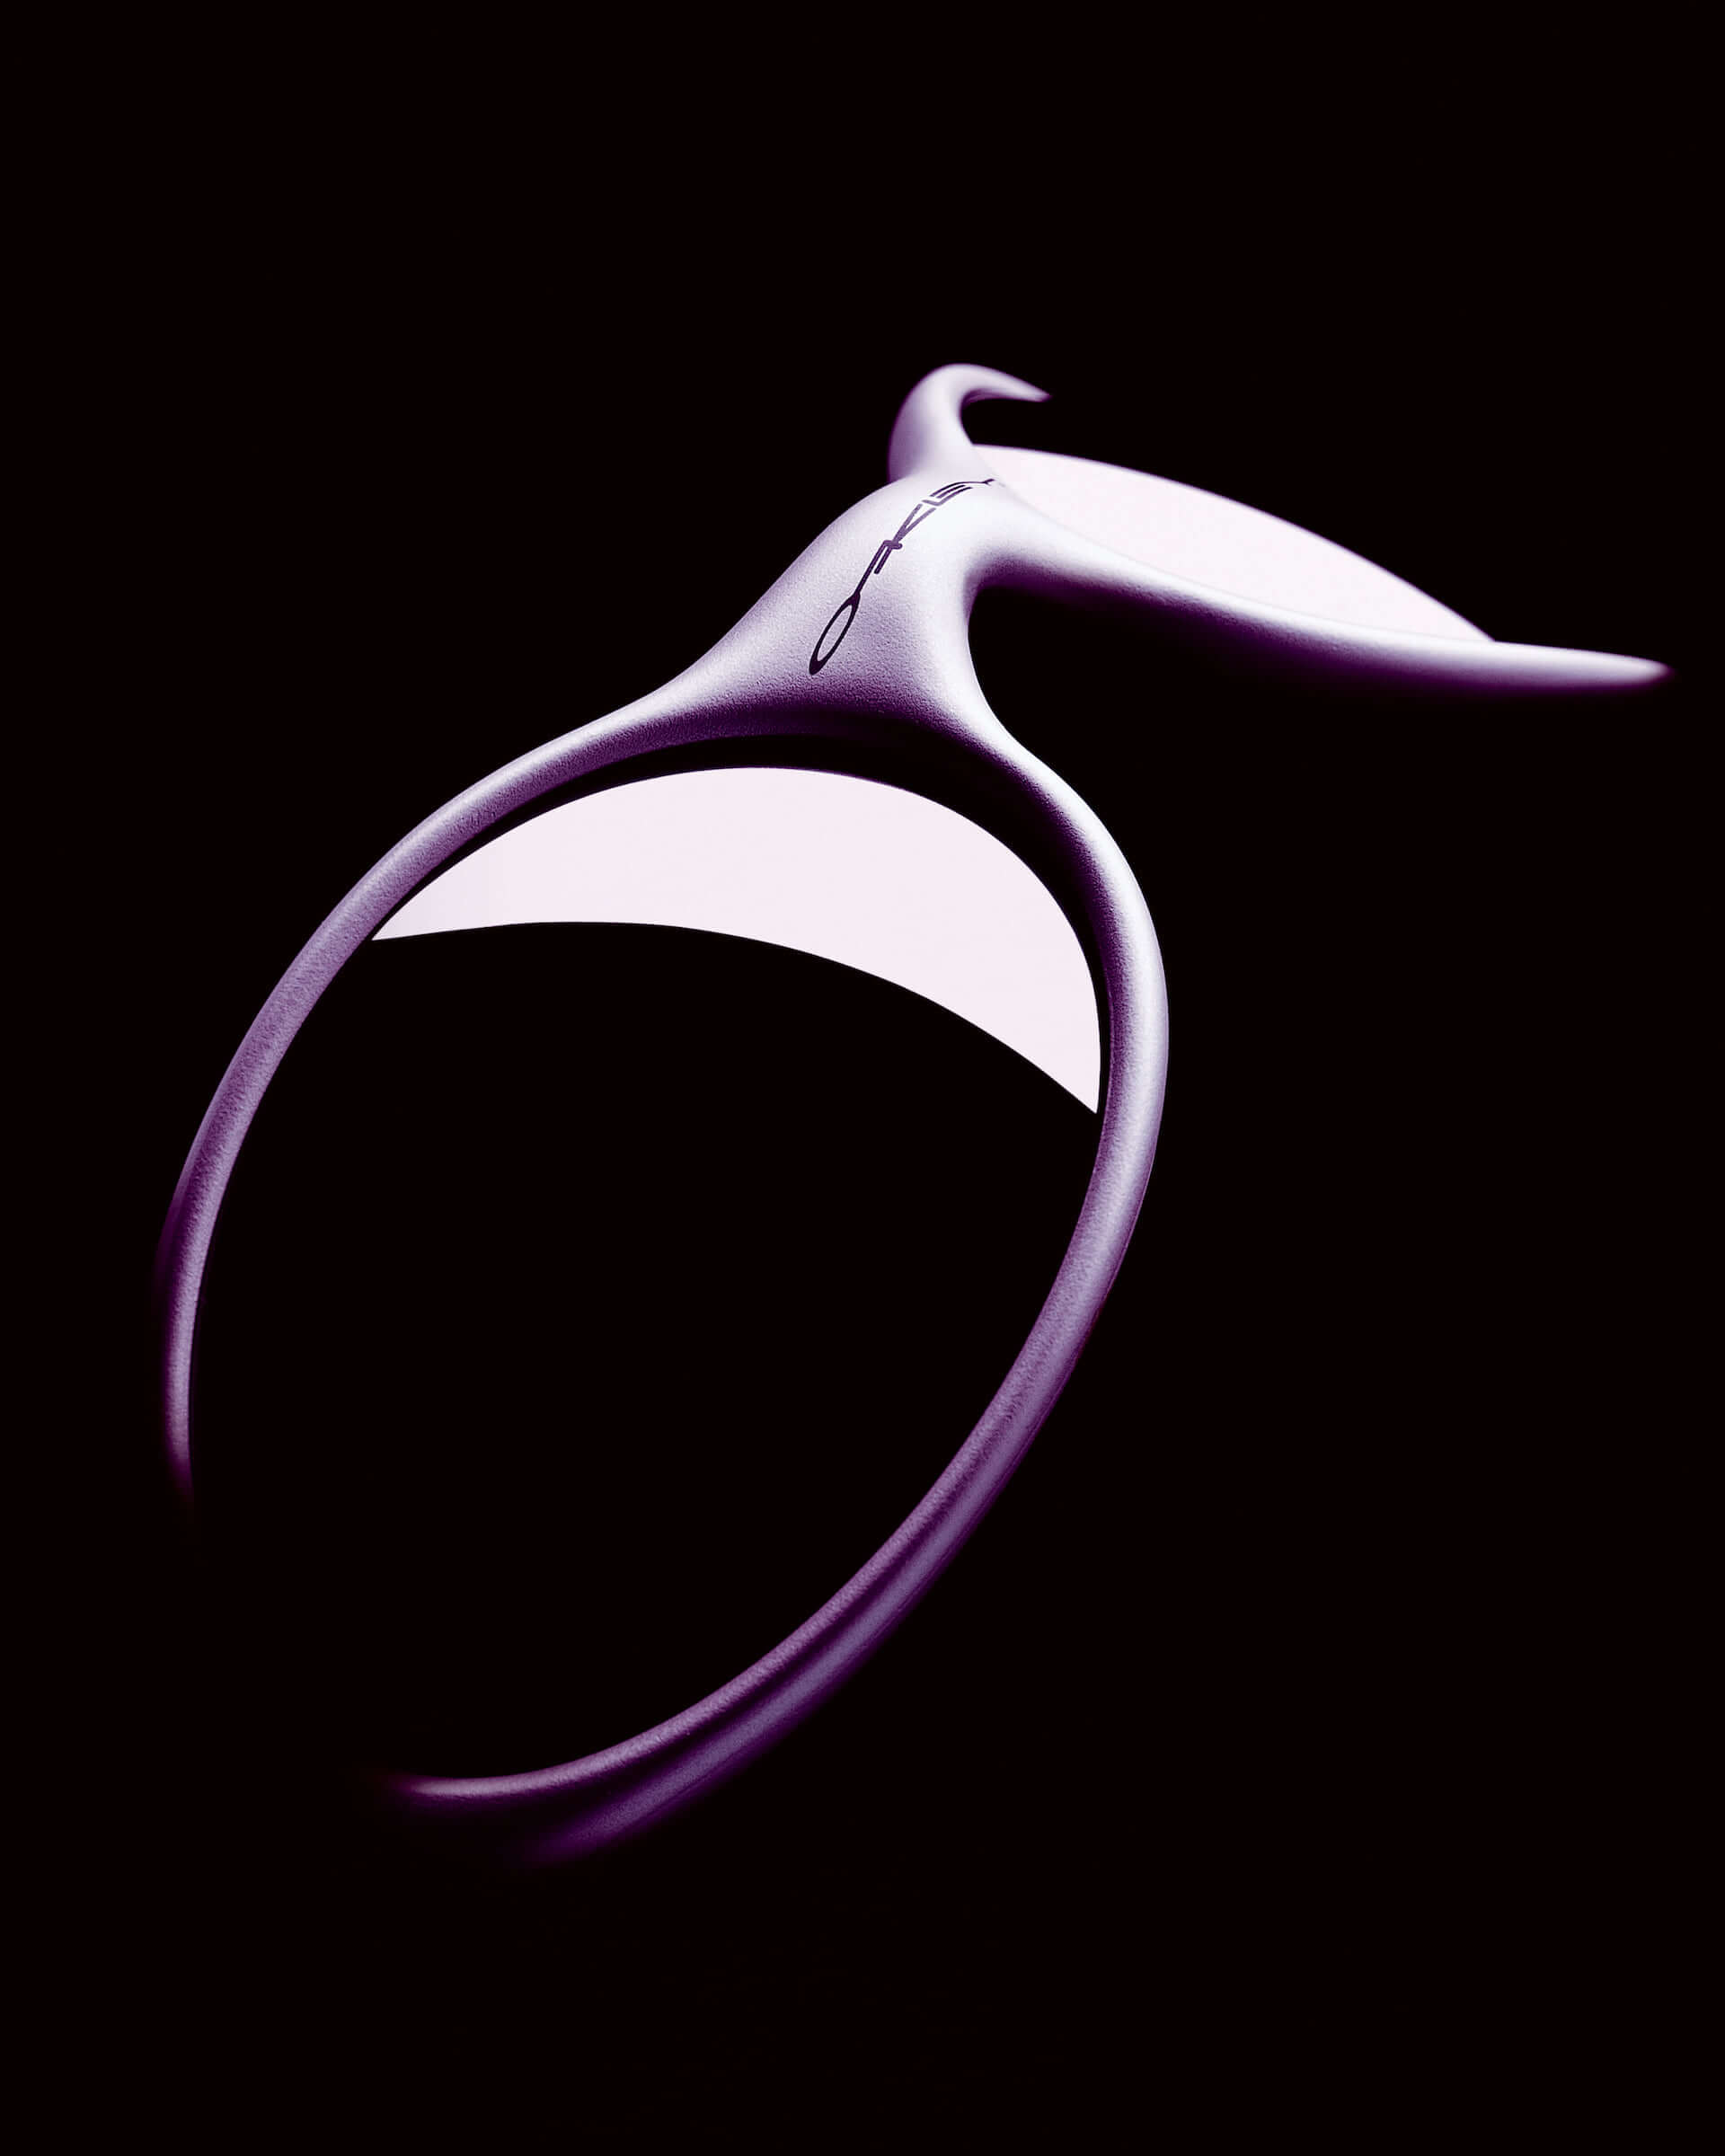 Netflixドキュメンタリー『マイケル・ジョーダン: ラストダンス』に登場するオークリーの名品を振り返る|かつてのスター達の着用モデルとは 200522_oakley_lastdance_11-1920x2400